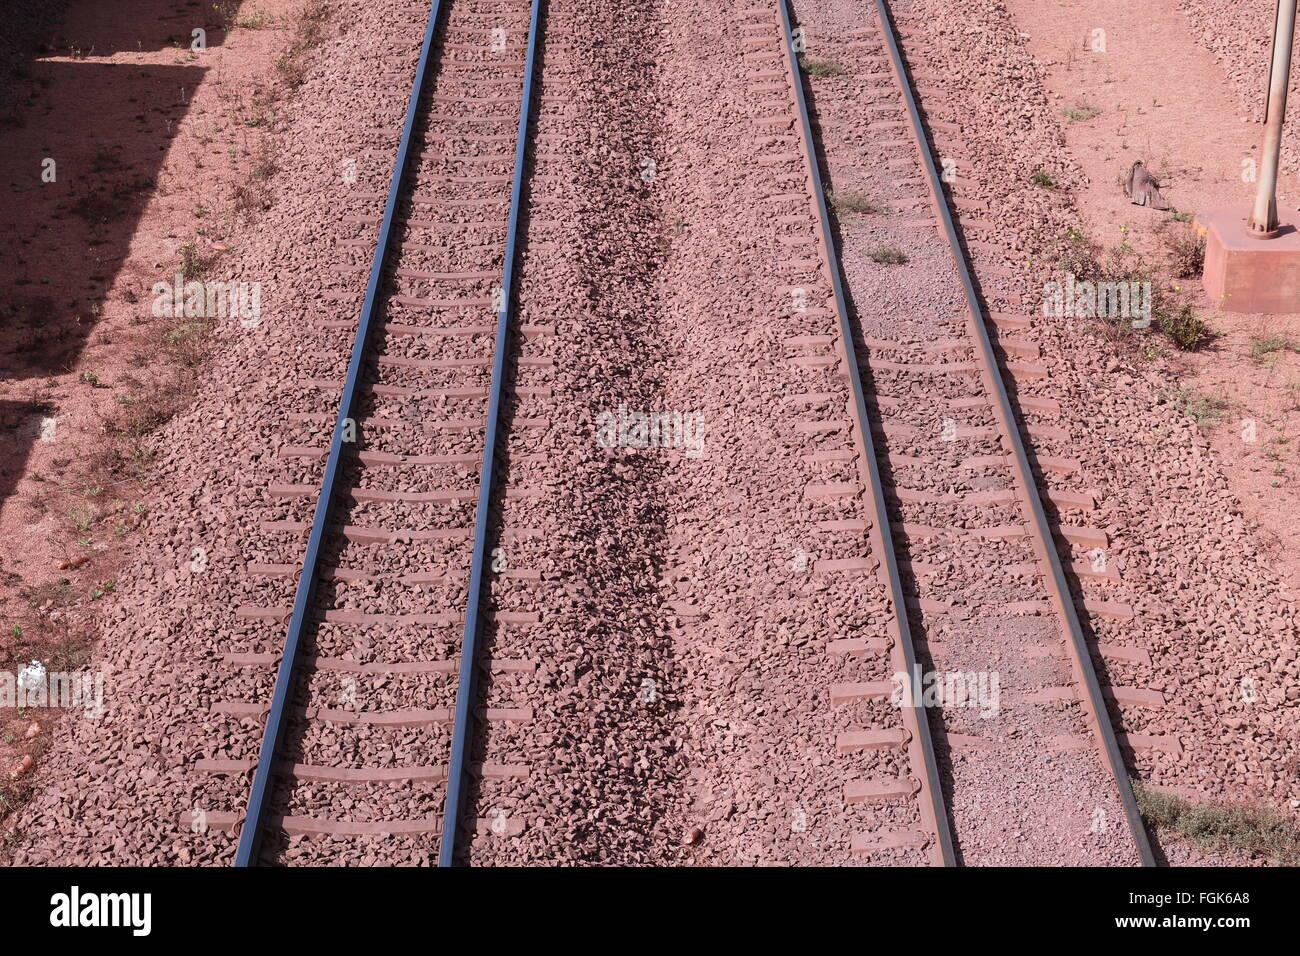 Railway lines, Saldanha Bay, Western Cape, South Africa - Stock Image